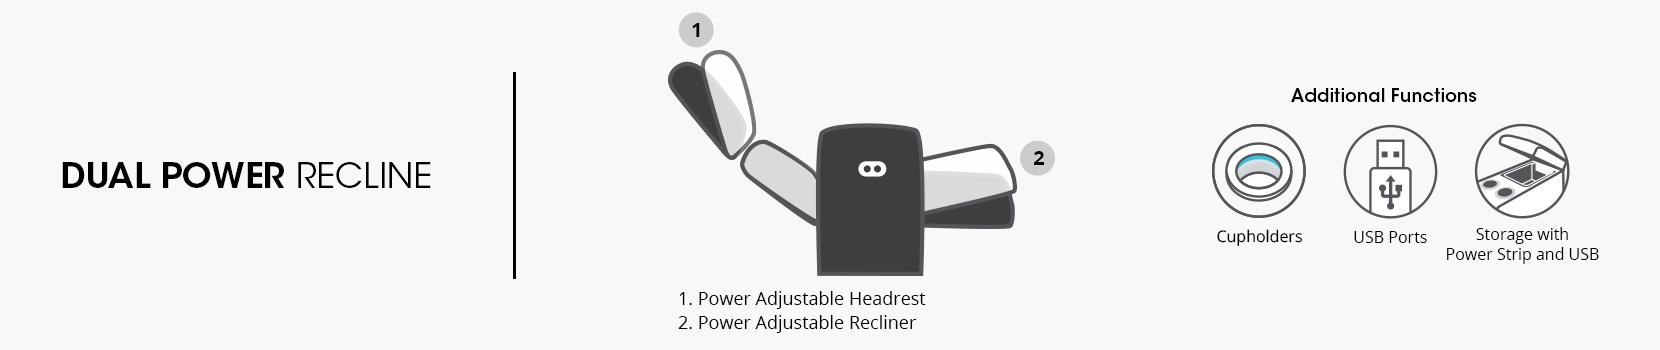 dual power recline. 1. power adjustable headrest. 2. power adjustable recliner. additional functions. cupholders. USB ports. storage with power strip and usb.